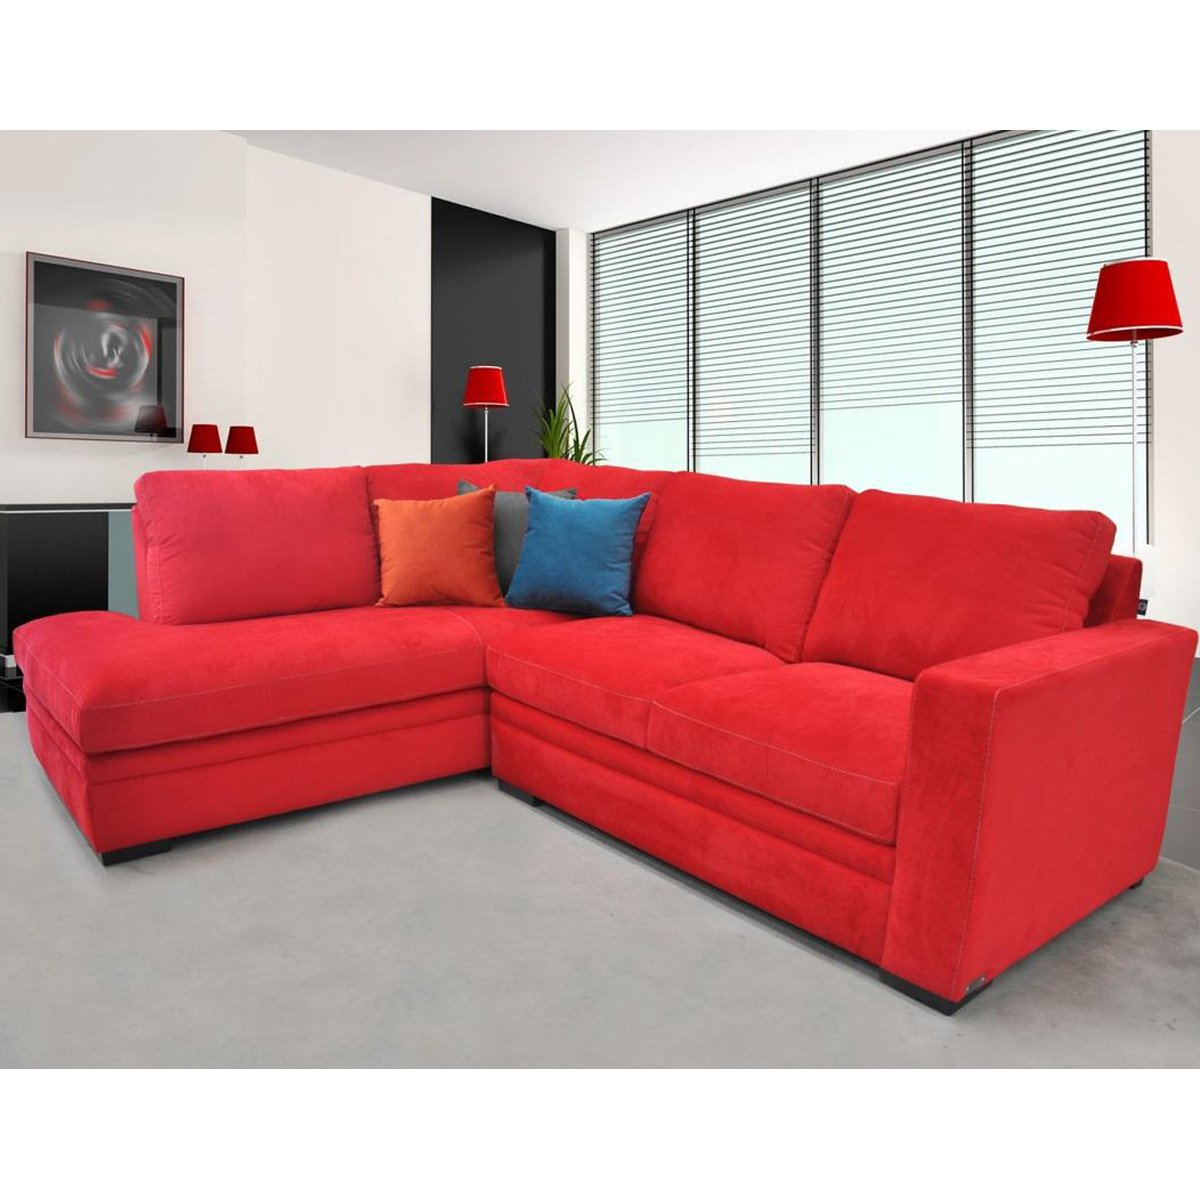 Sala modular riu muebles liz sears com mx me entiende for Modelar muebles